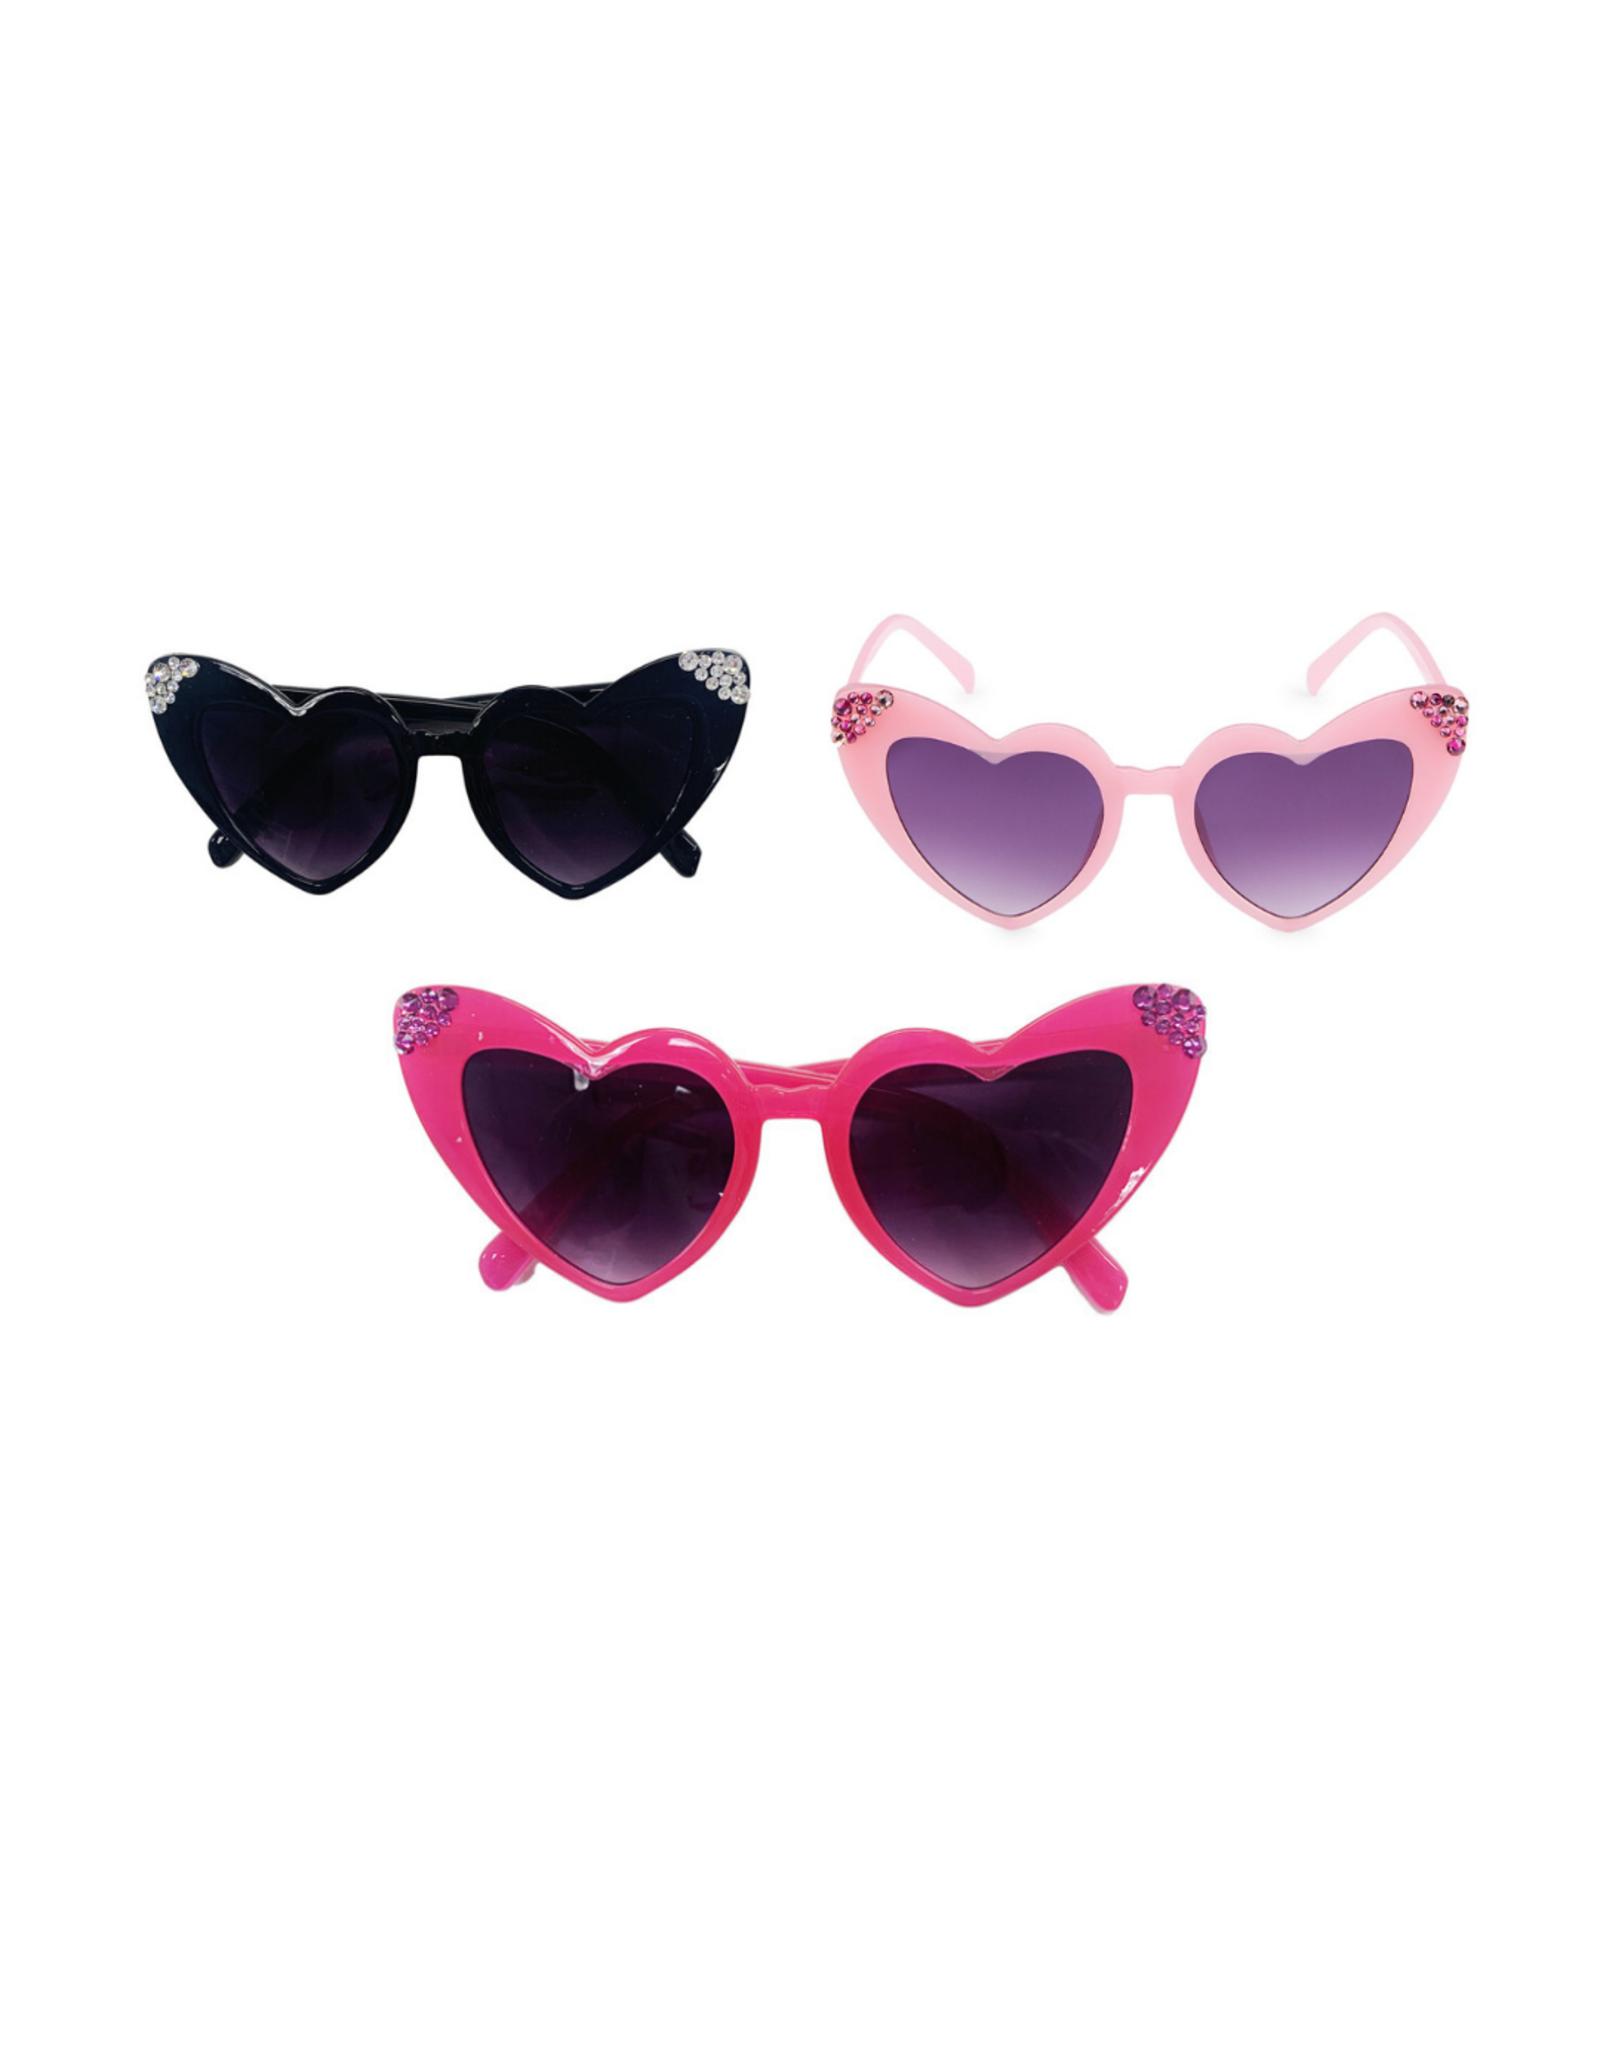 Bari Lynn Crystallized Heart Sunglasses